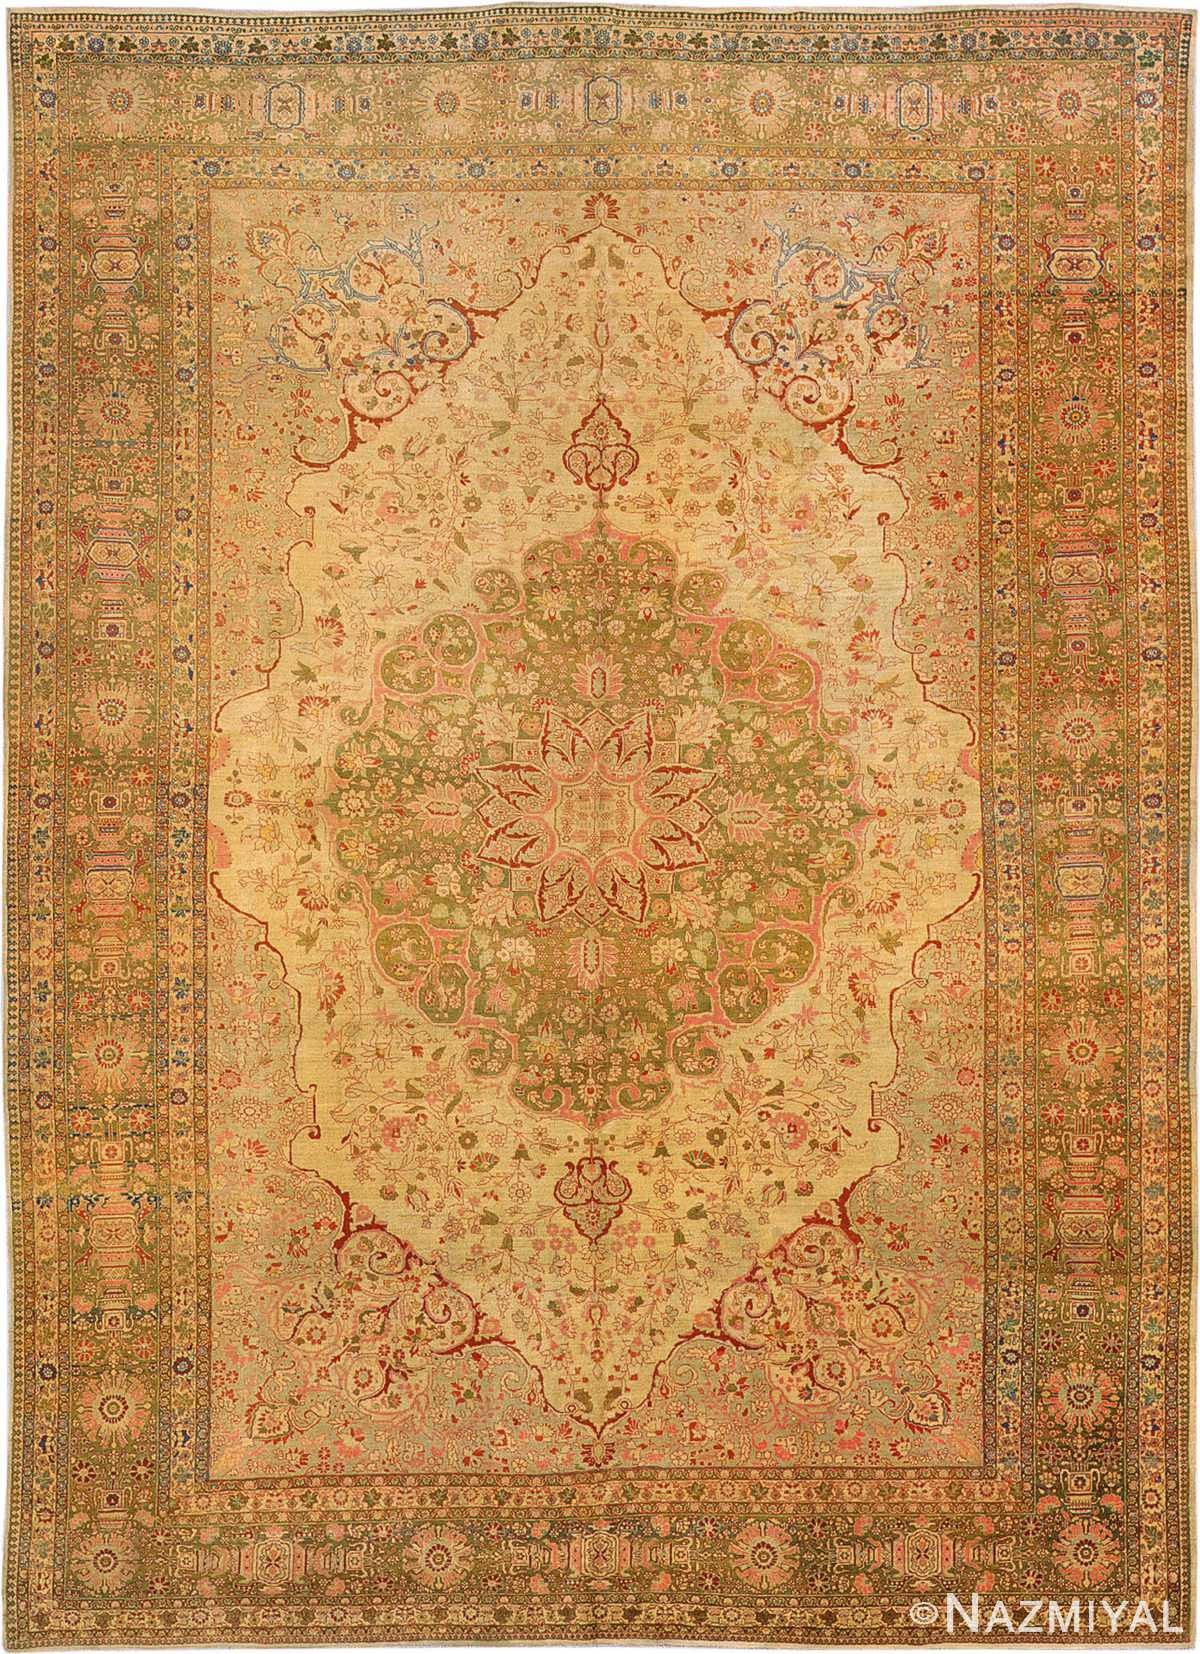 Antique Tabriz Persian Rug 3035 Nazmiyal